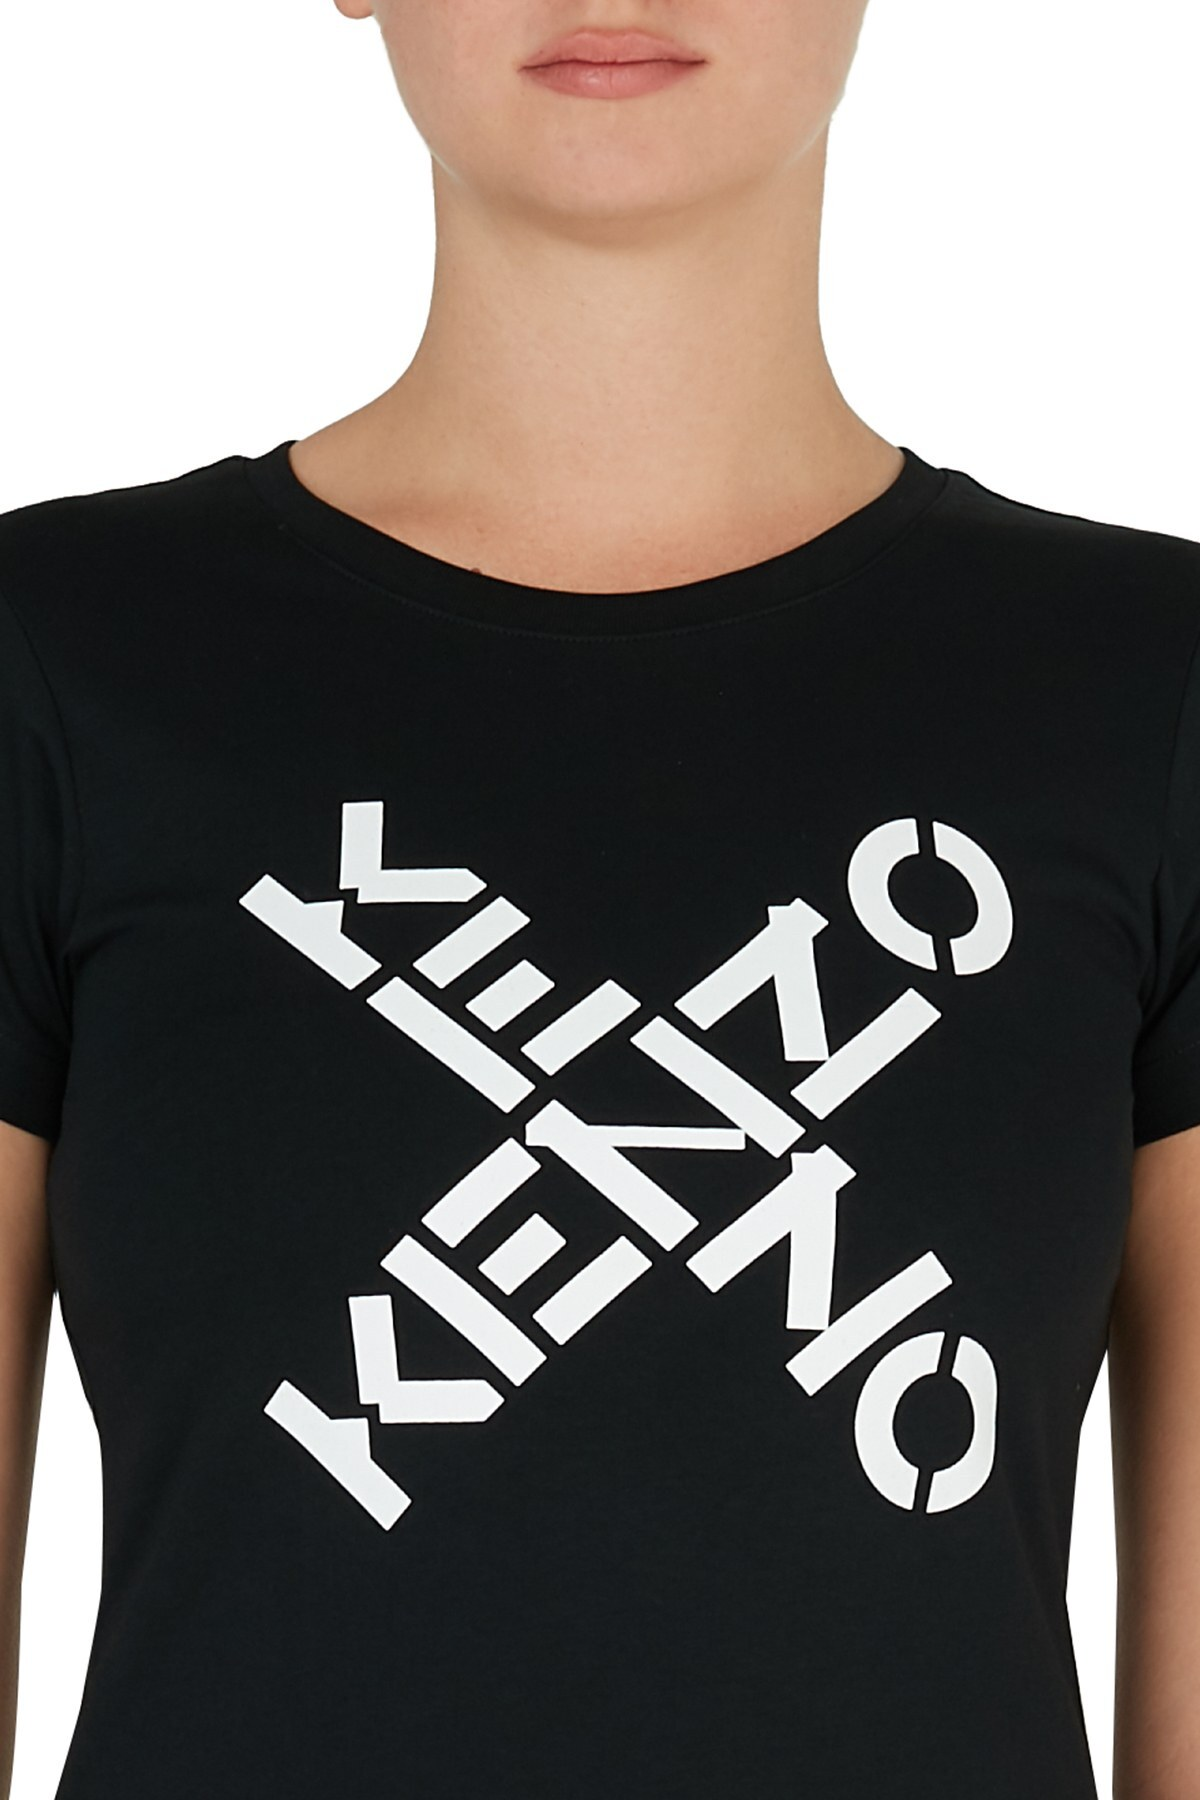 Kenzo Baskılı Bisiklet Yaka % 100 Pamuk Kadın T Shirt FA6 2TS720 4SJ 99 SİYAH